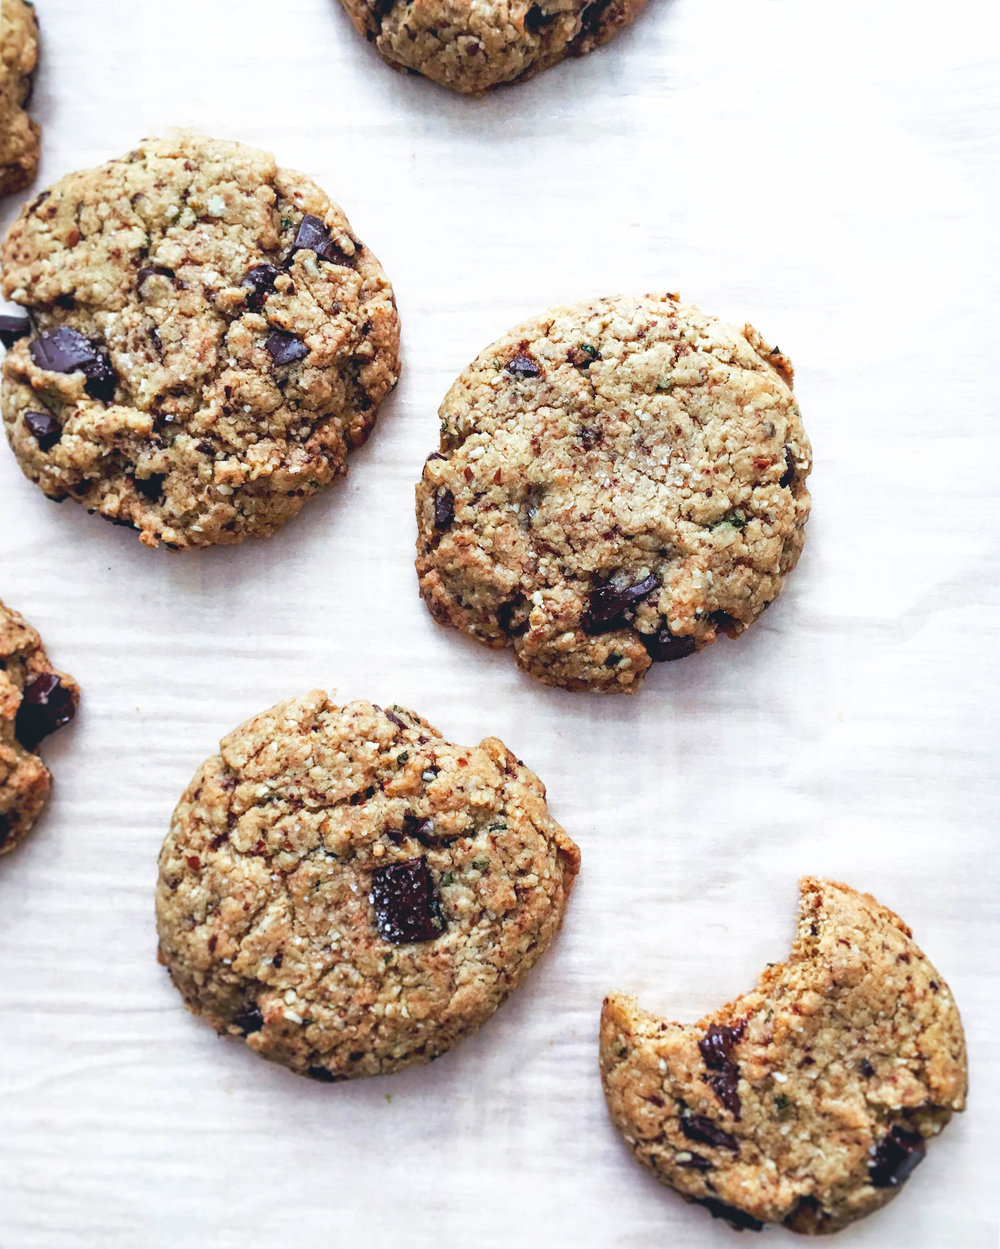 vegan-gluten-free-chocolate-chunk-olive-oil-tahini-cookies.jpg